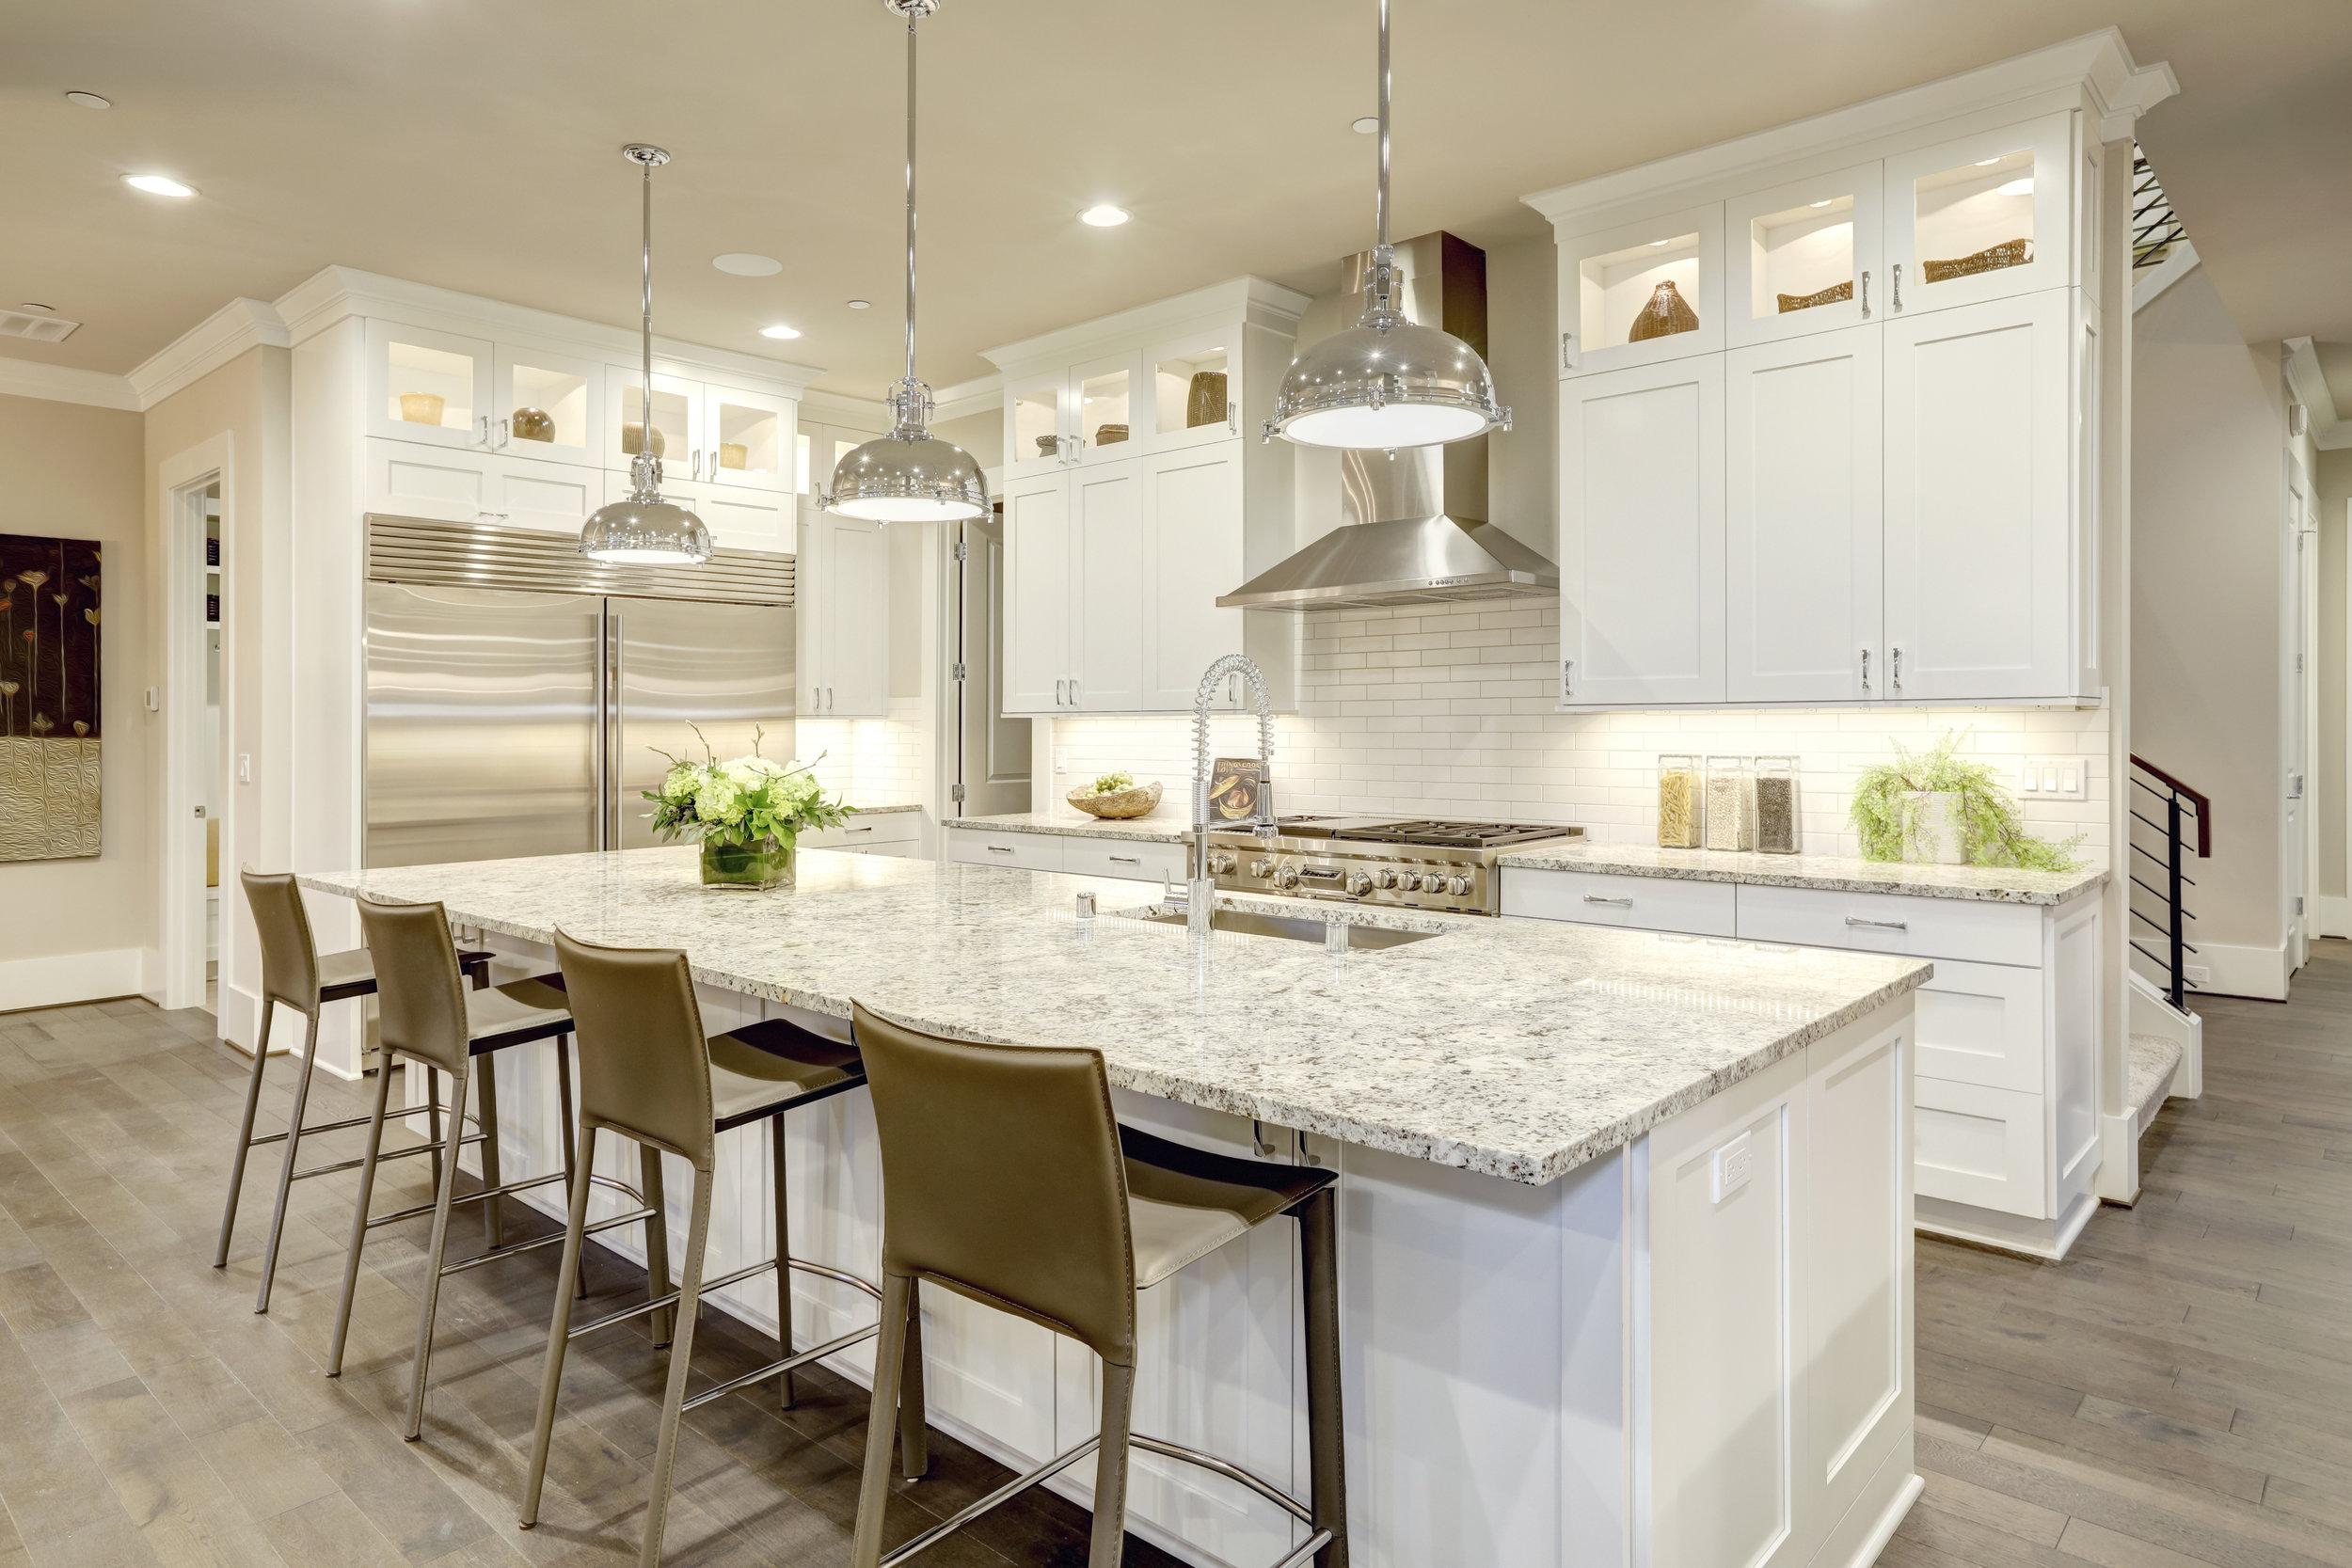 bigstock-White-Kitchen-Design-In-New-Lu-165494126.jpg